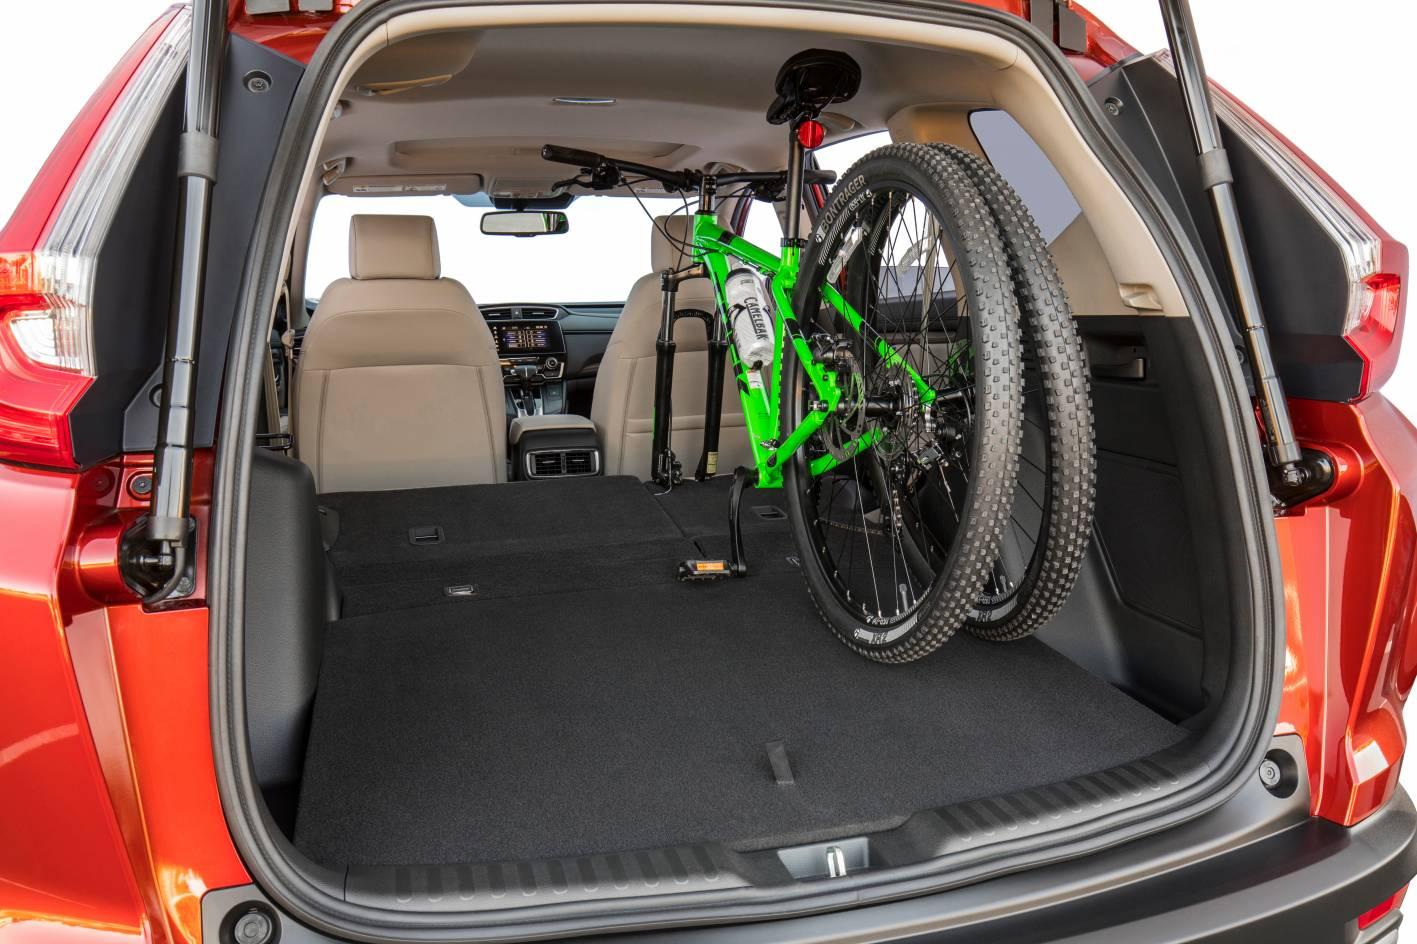 2015 Honda Crv Trunk Dimensions >> All turbo line-up and 7-seats for 2018 Honda CR-V - ForceGT.com